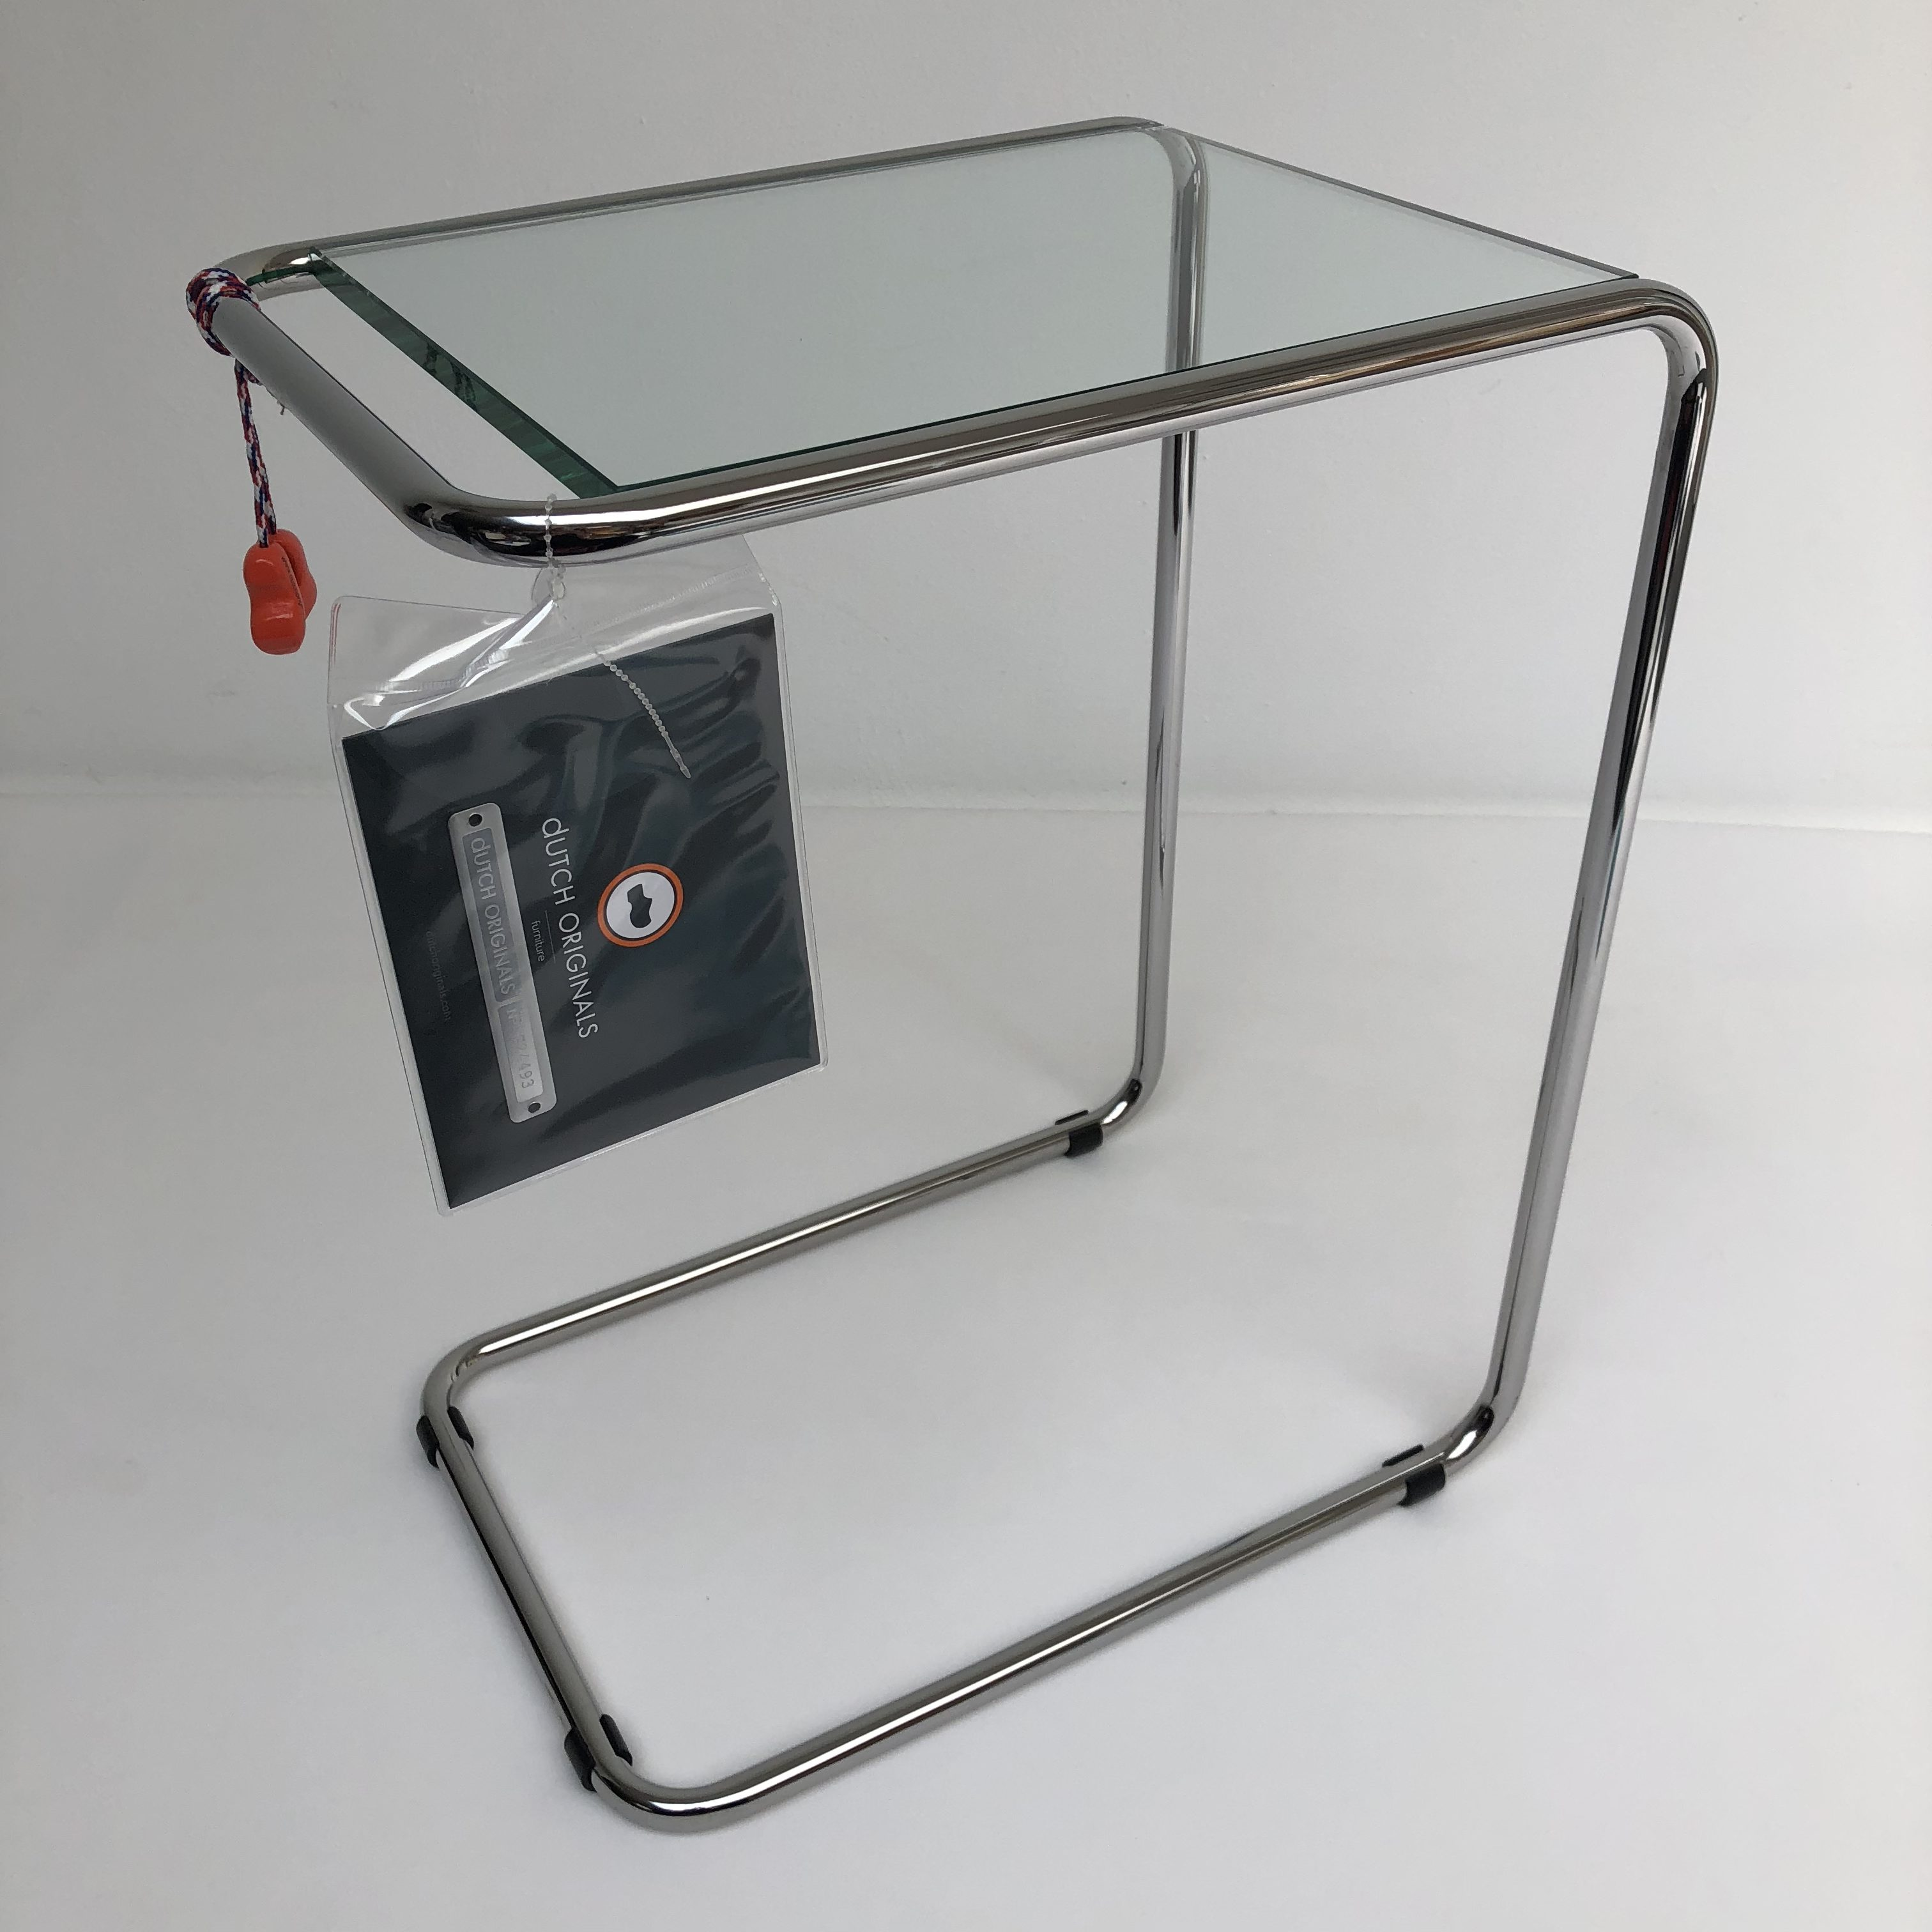 Bijzettafel In Glas.Gispen Today 530 Bijzettafel In Chroom En Glas Hello Design Classics